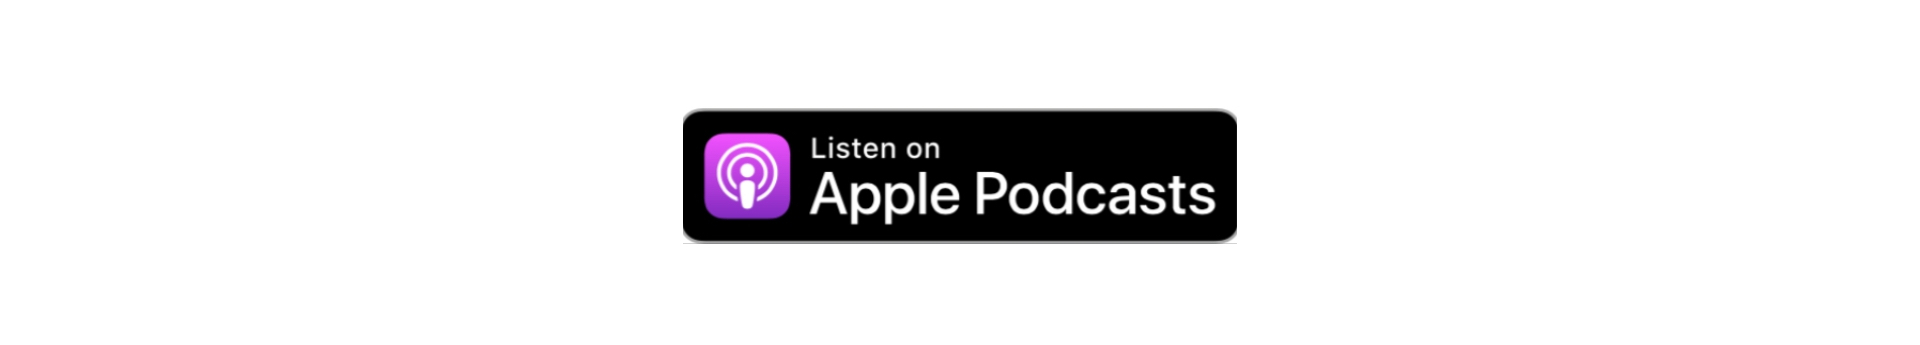 Podcast Icon Small.jpg